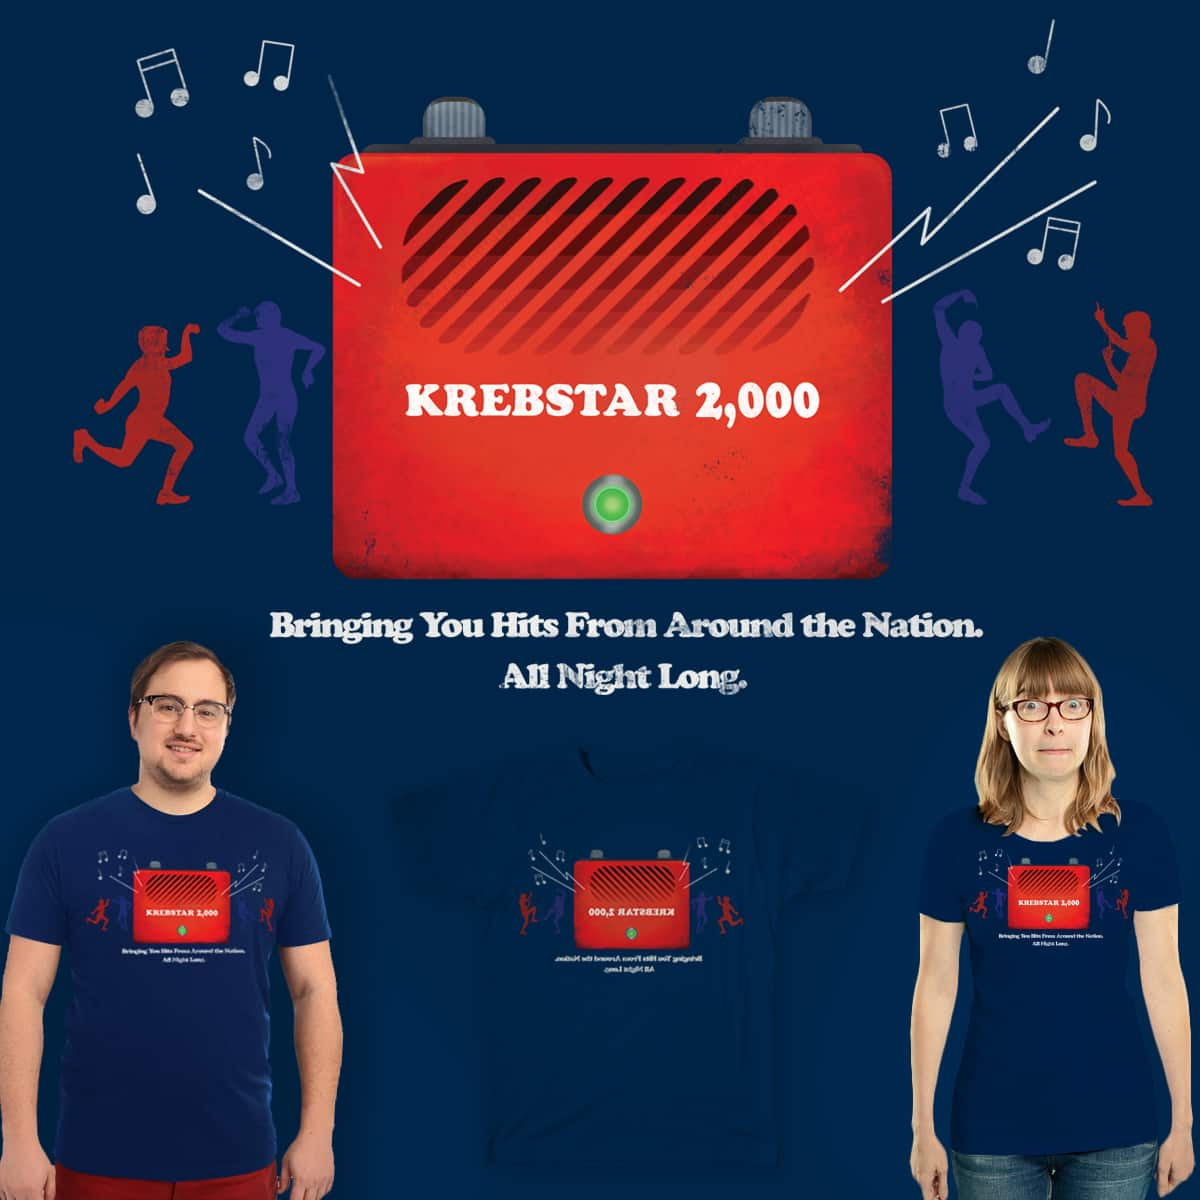 The Krebstar 2,000 by Prescott_Girl on Threadless